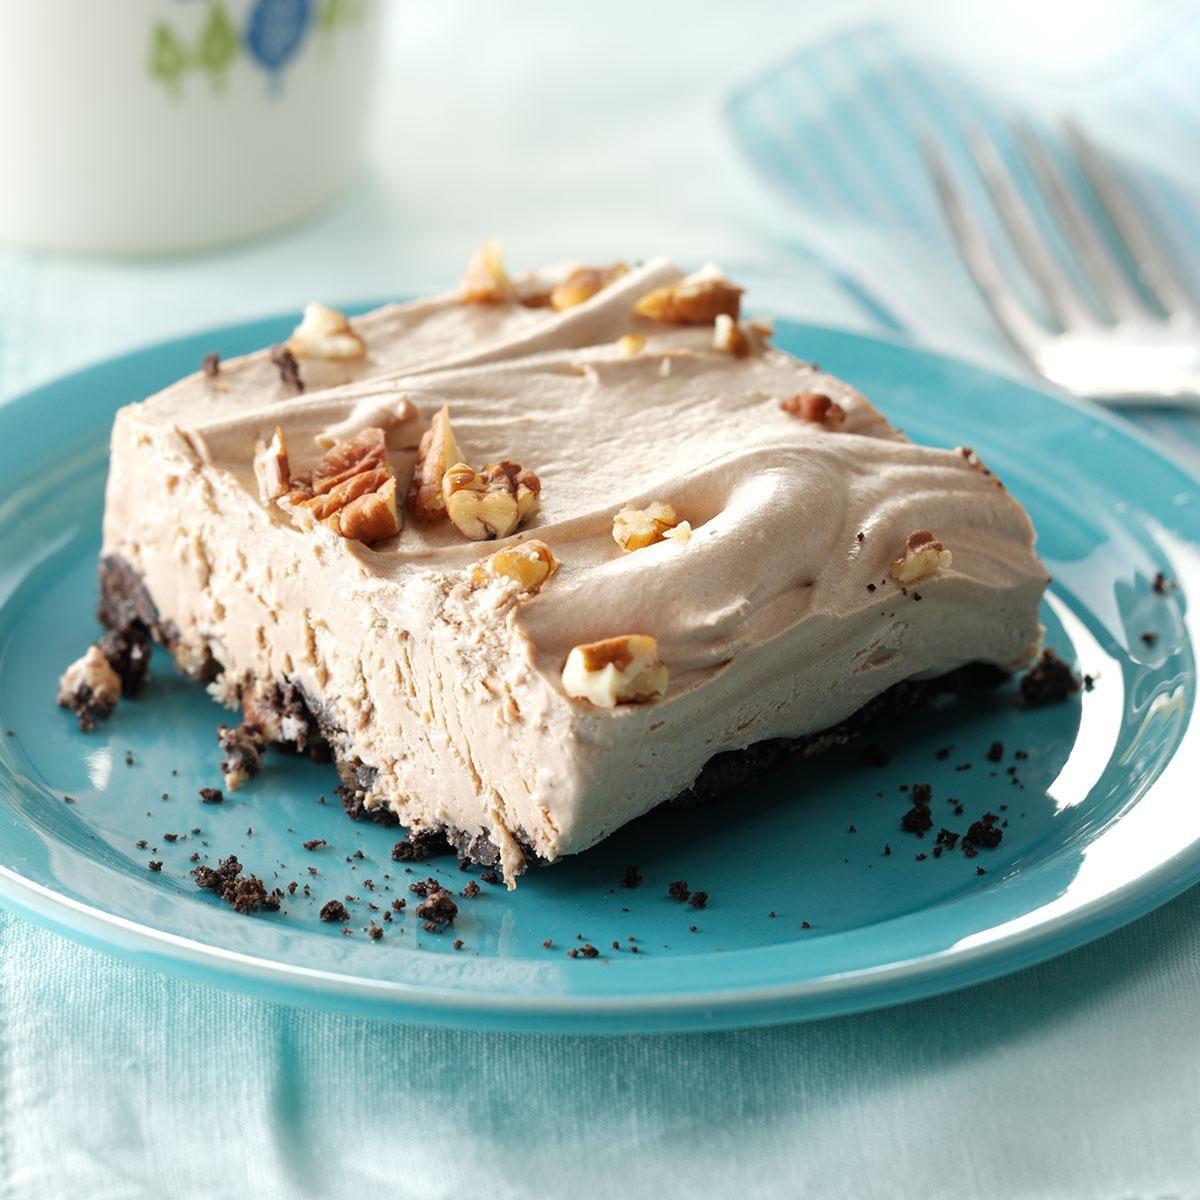 Creamy Mocha Frozen Dessert Recipe